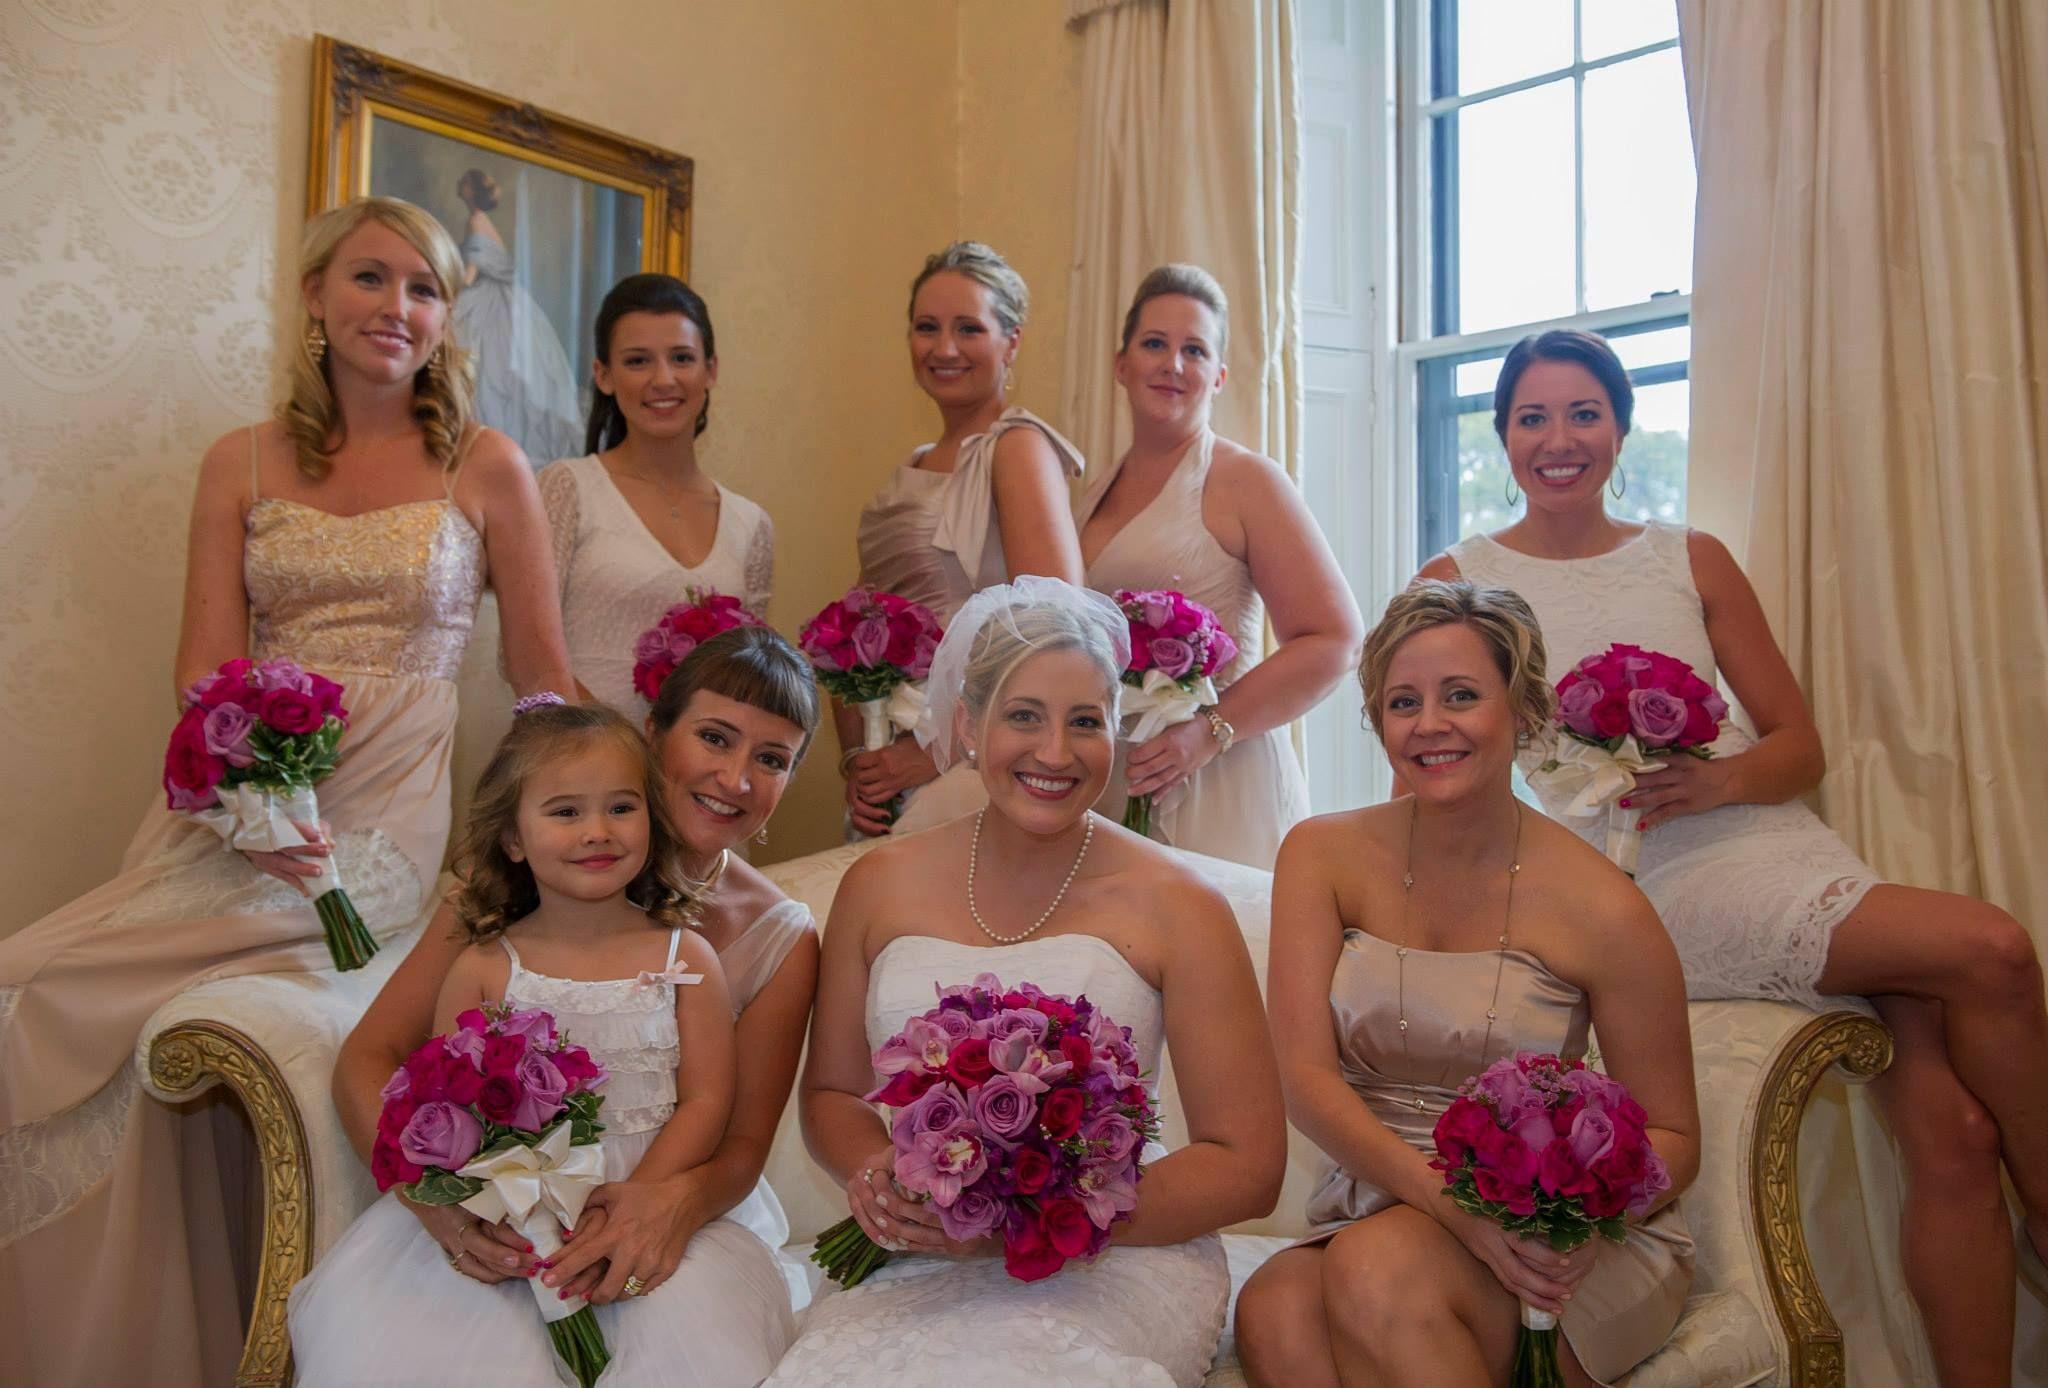 Pin on Massachusetts Weddings